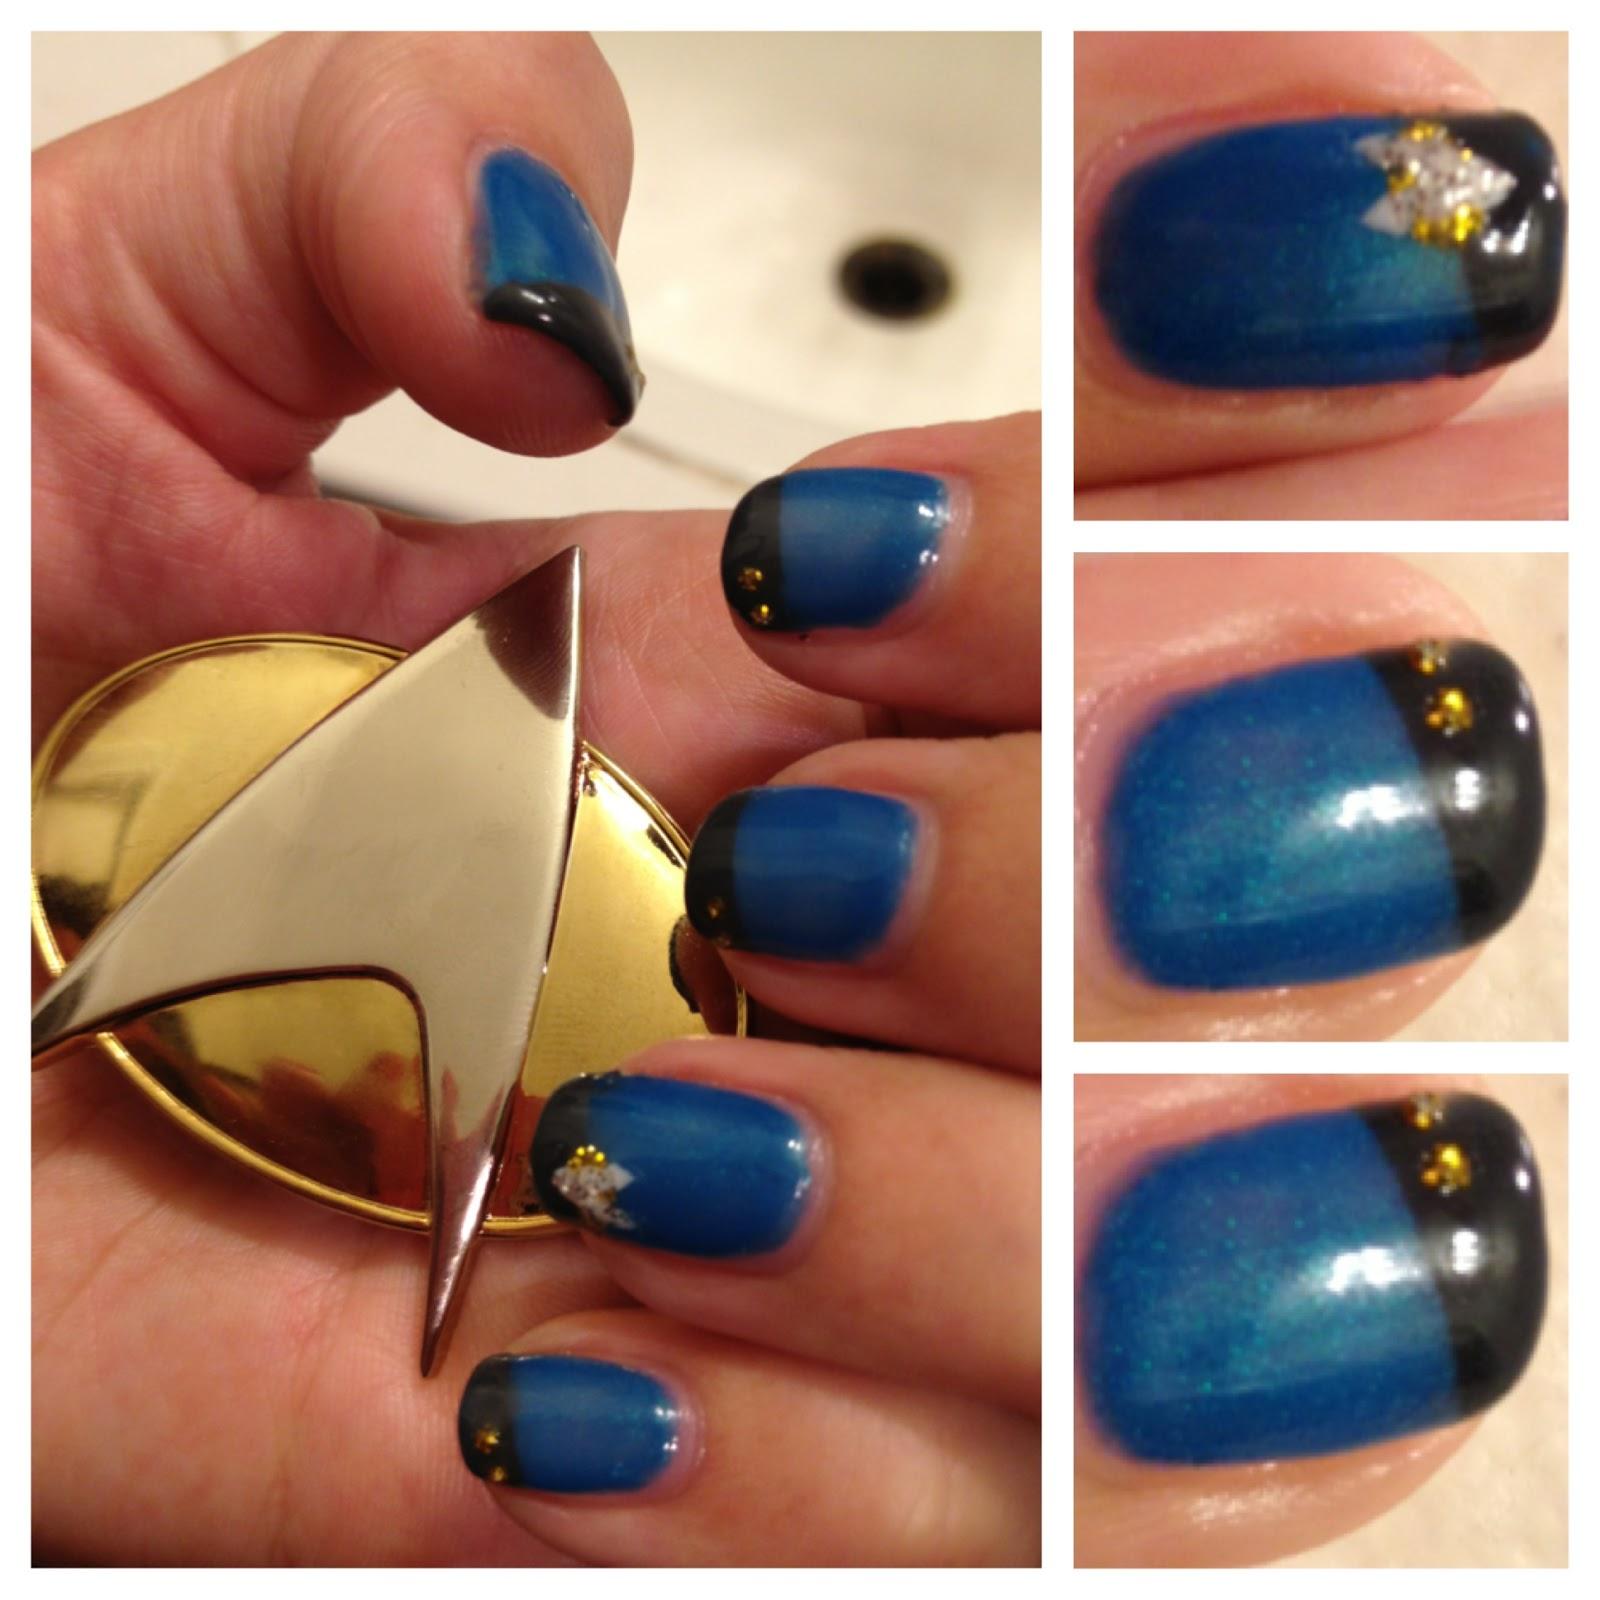 Star Trek Nails Shellacnailart